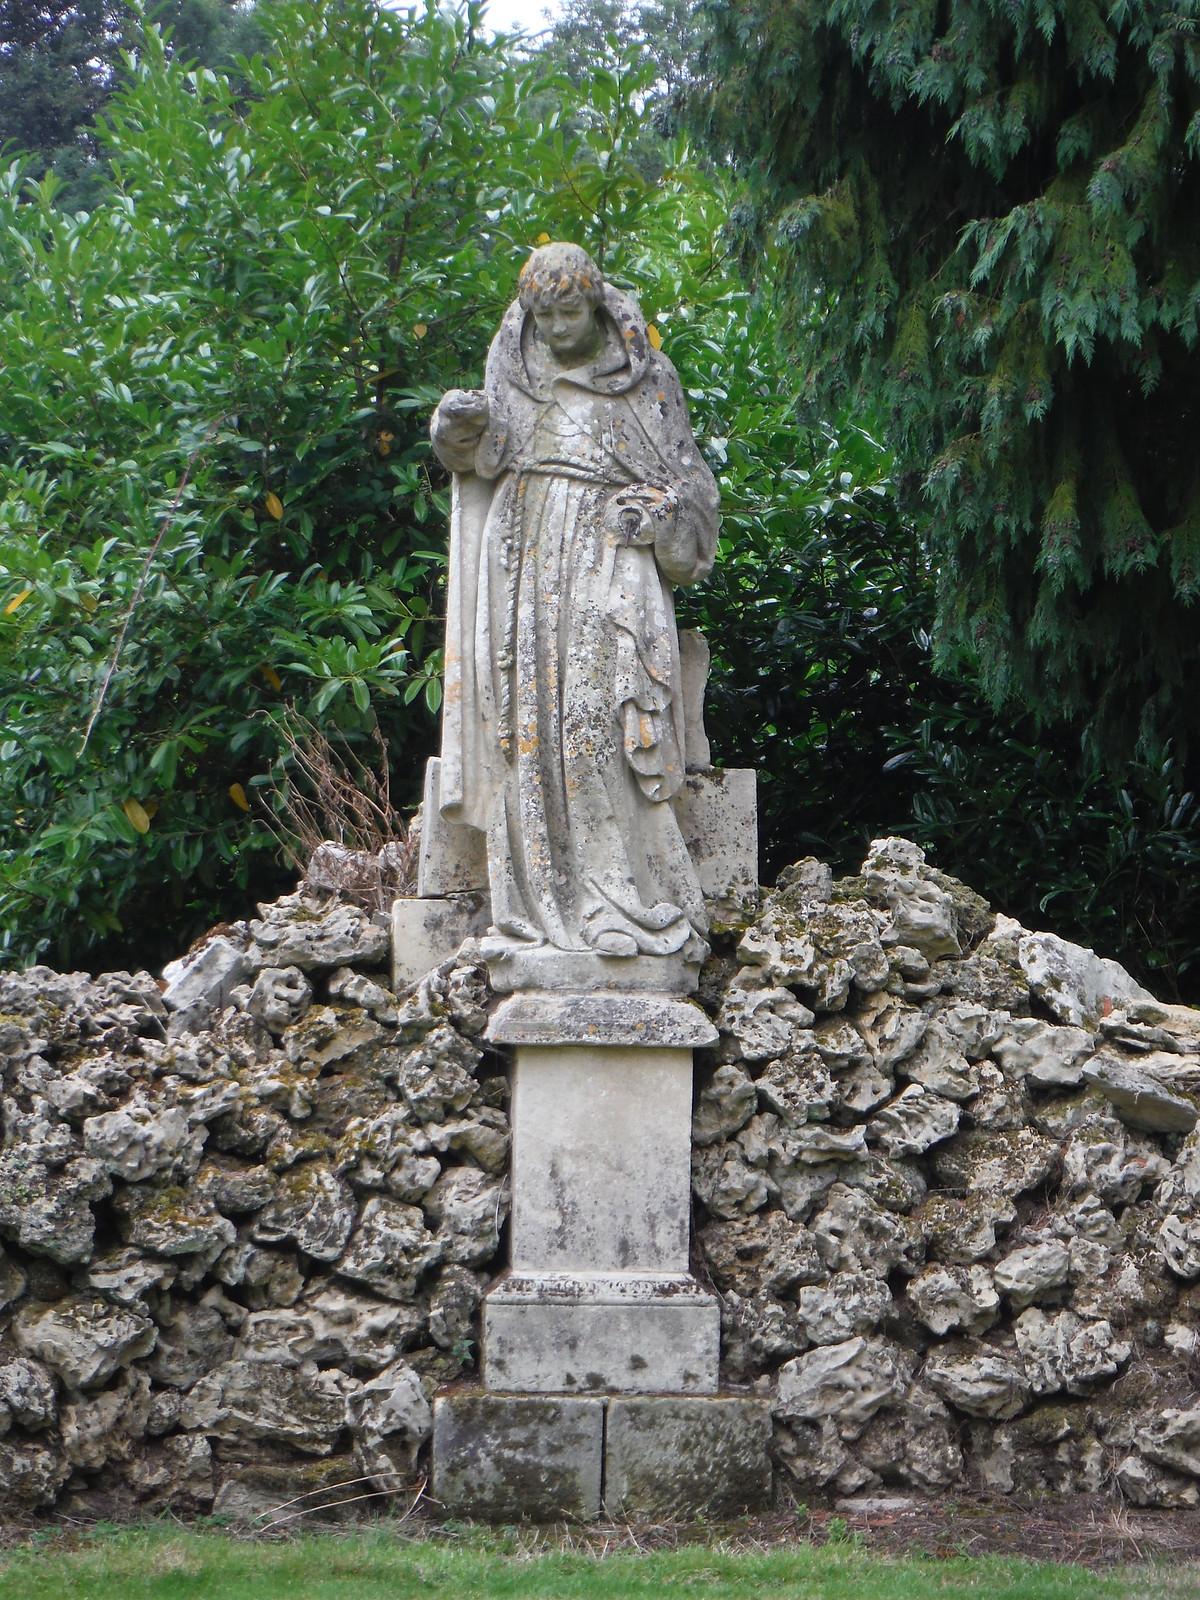 St. Anthony of Padua SWC Walk 252 Tisbury Circular via Donhead St. Andrew